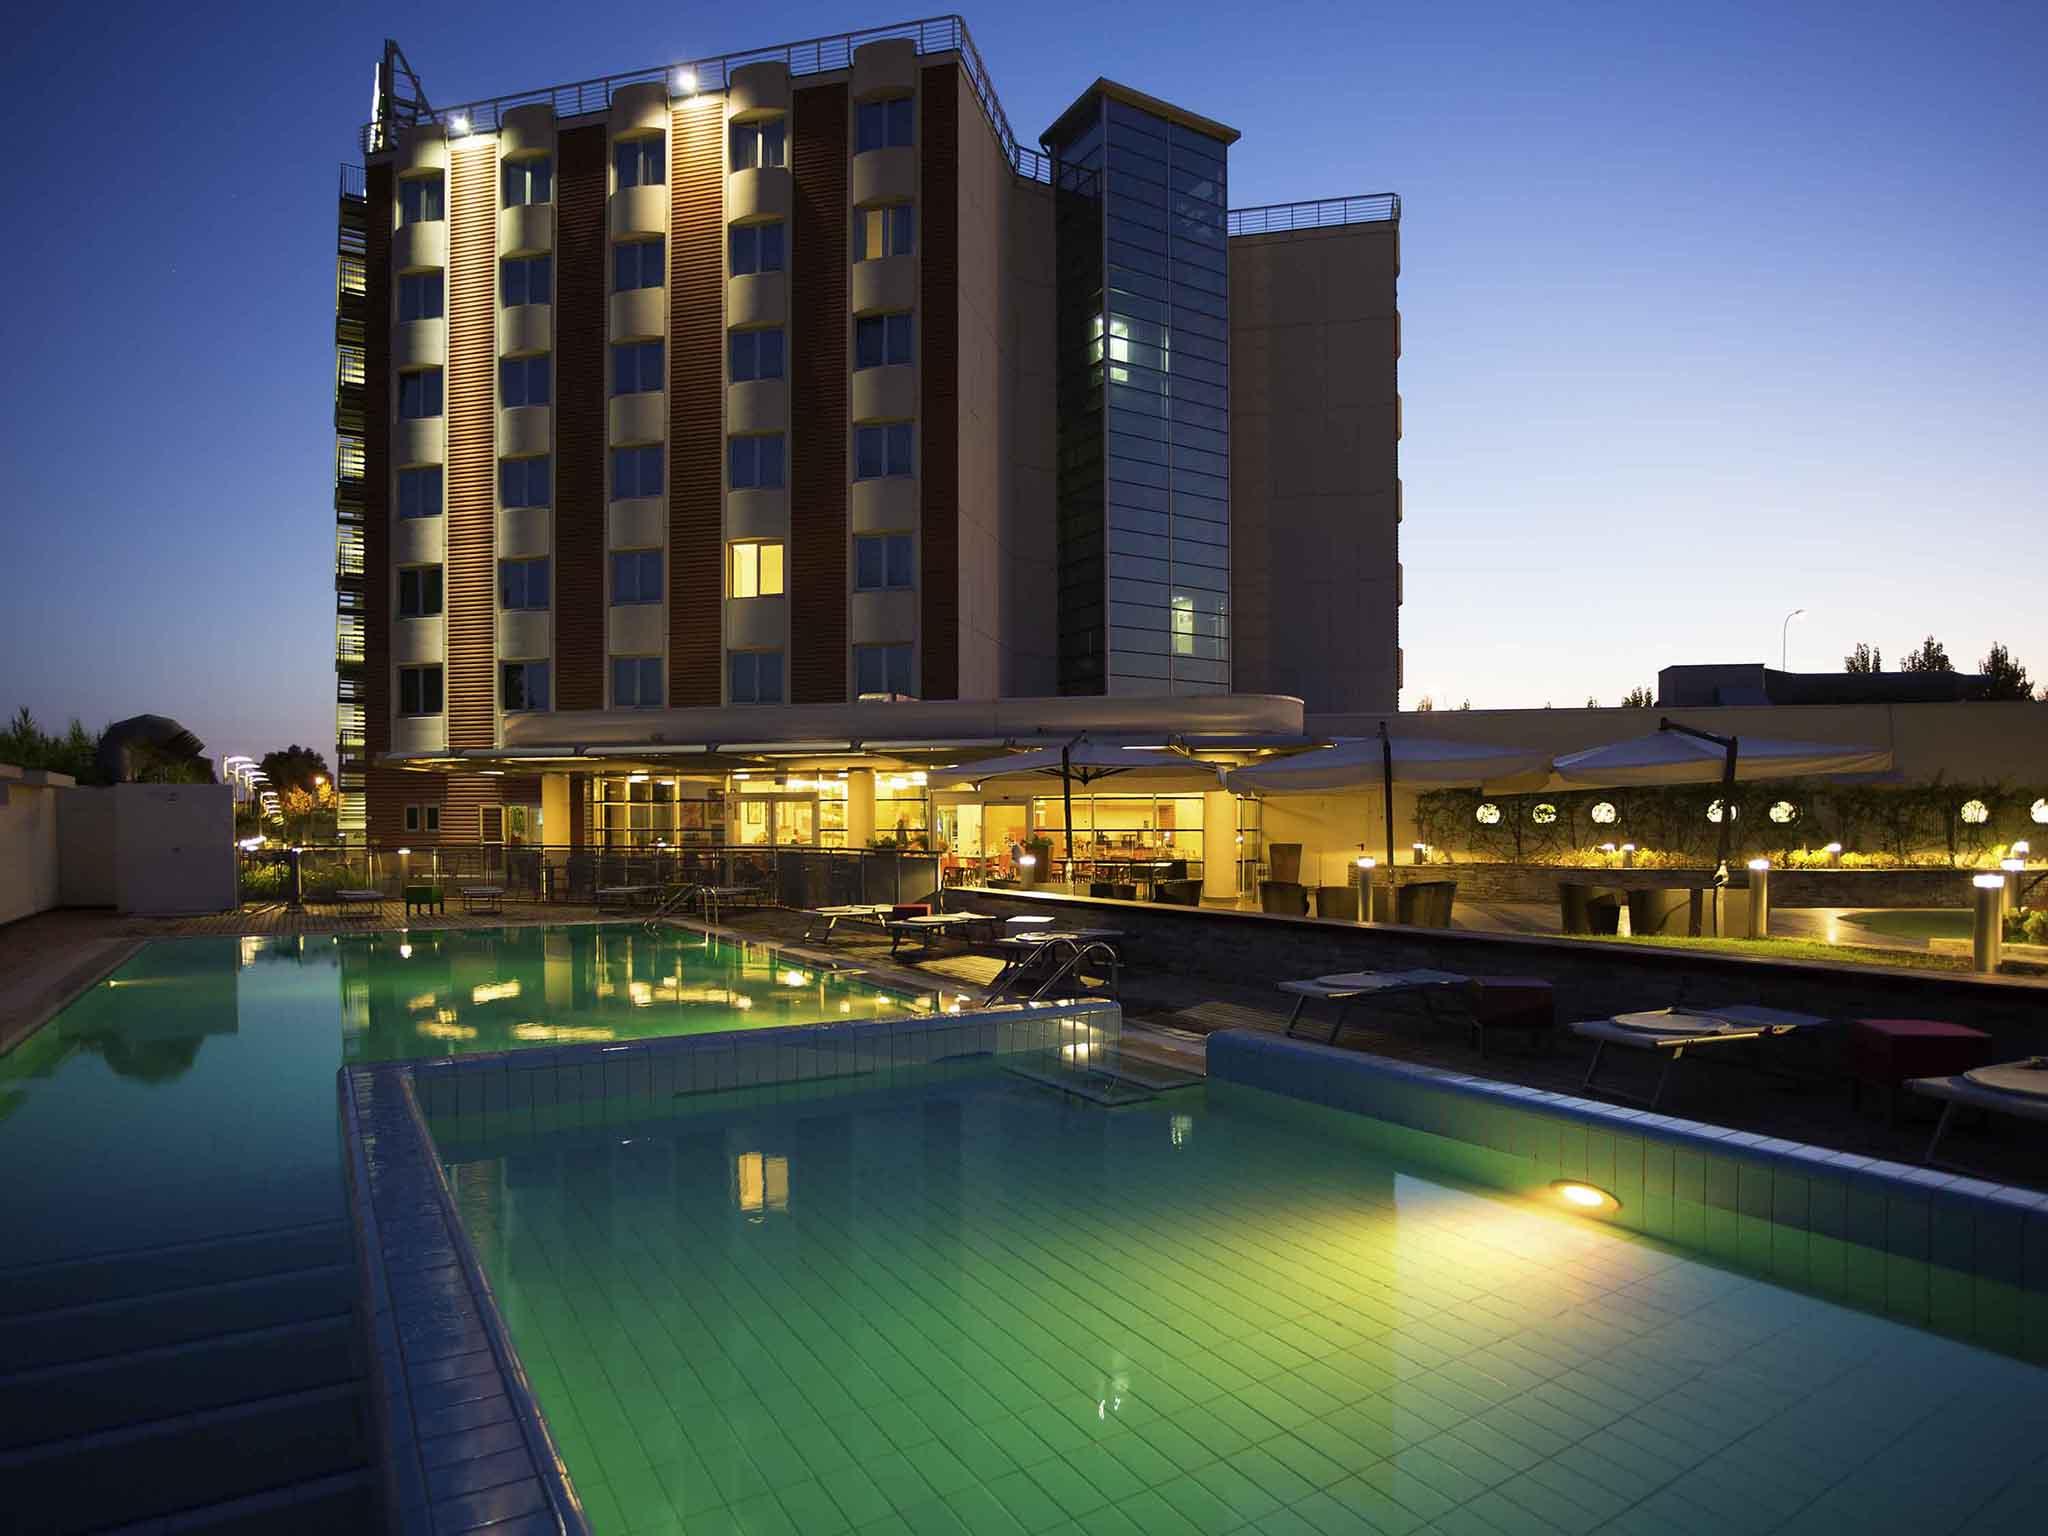 Hotel - Novotel Salerno Est Arechi